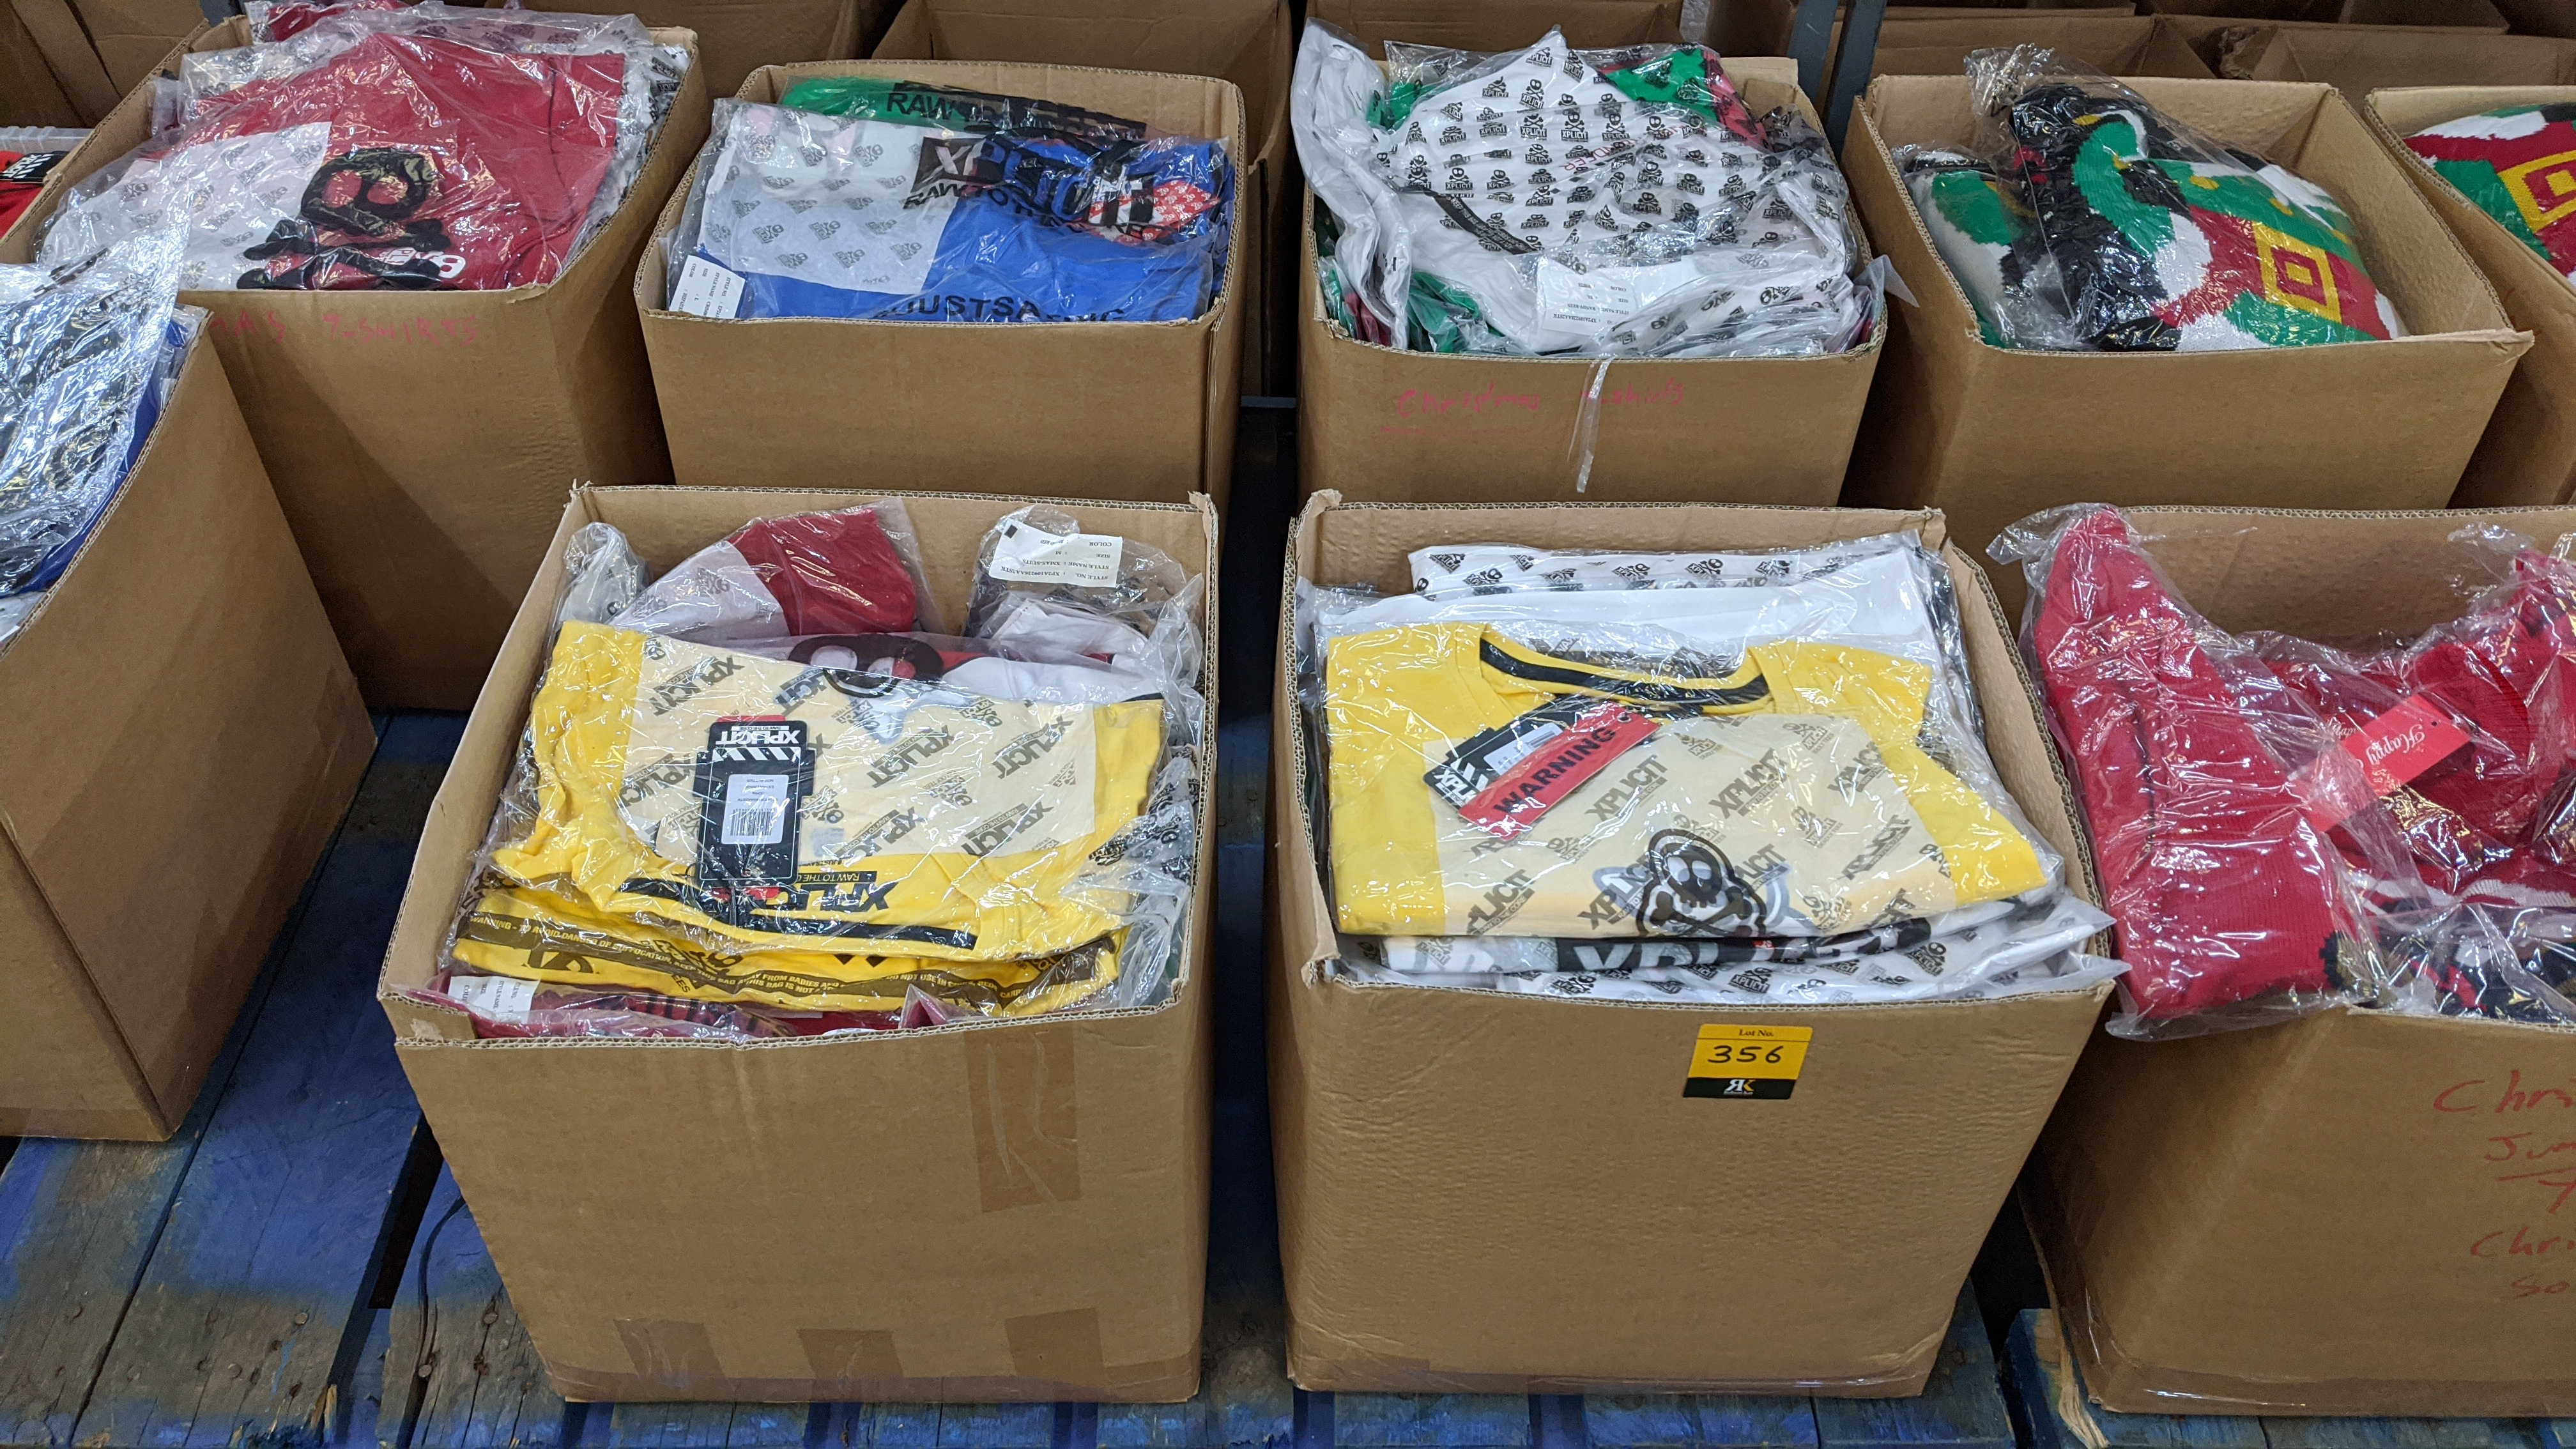 Very large quantity of primarily men's designer clothing & accessories. - Image 119 of 157